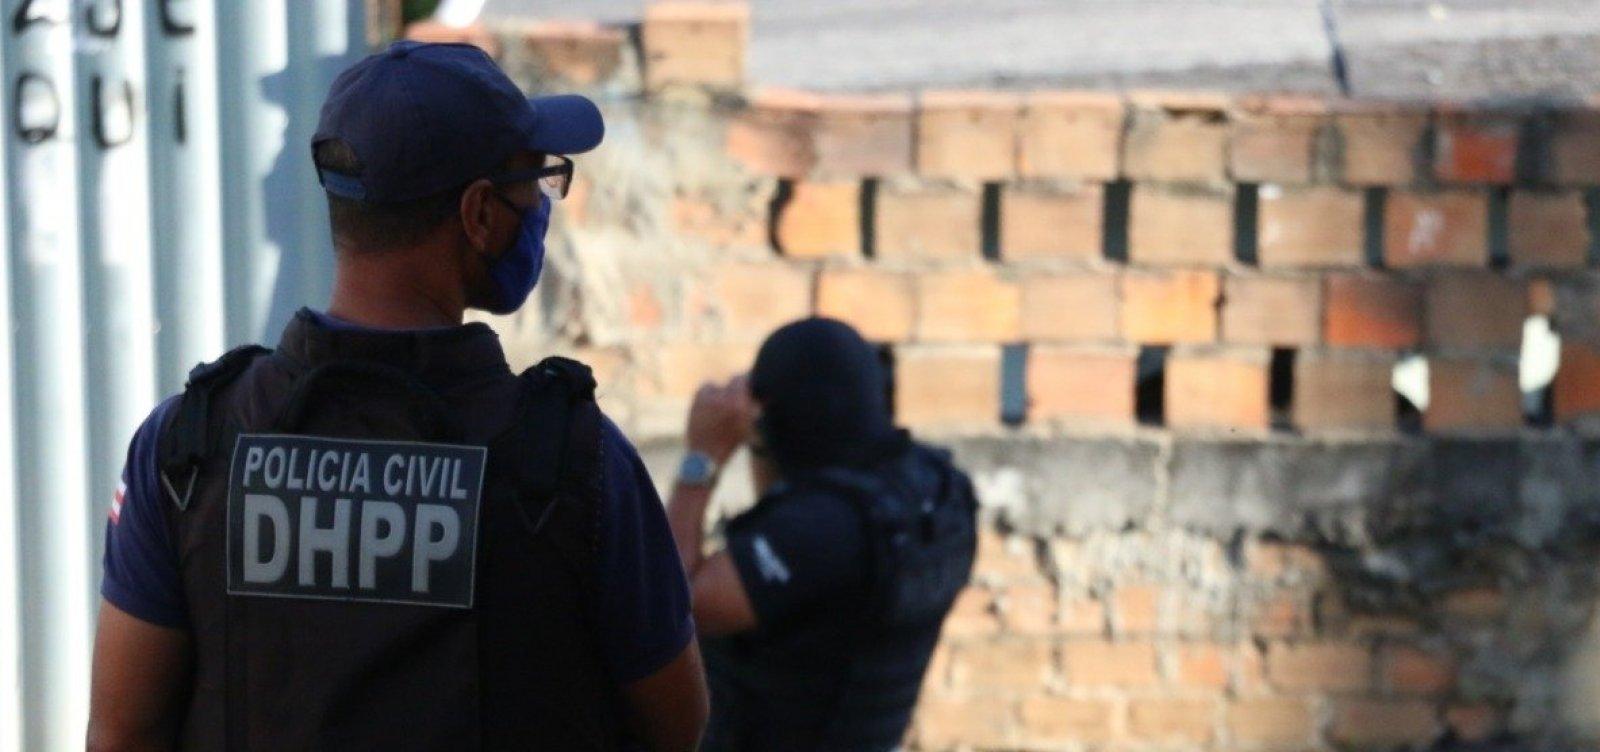 Justiça converte para preventiva prisão de suspeitos de triplo homicídio na praia de Jaguaribe